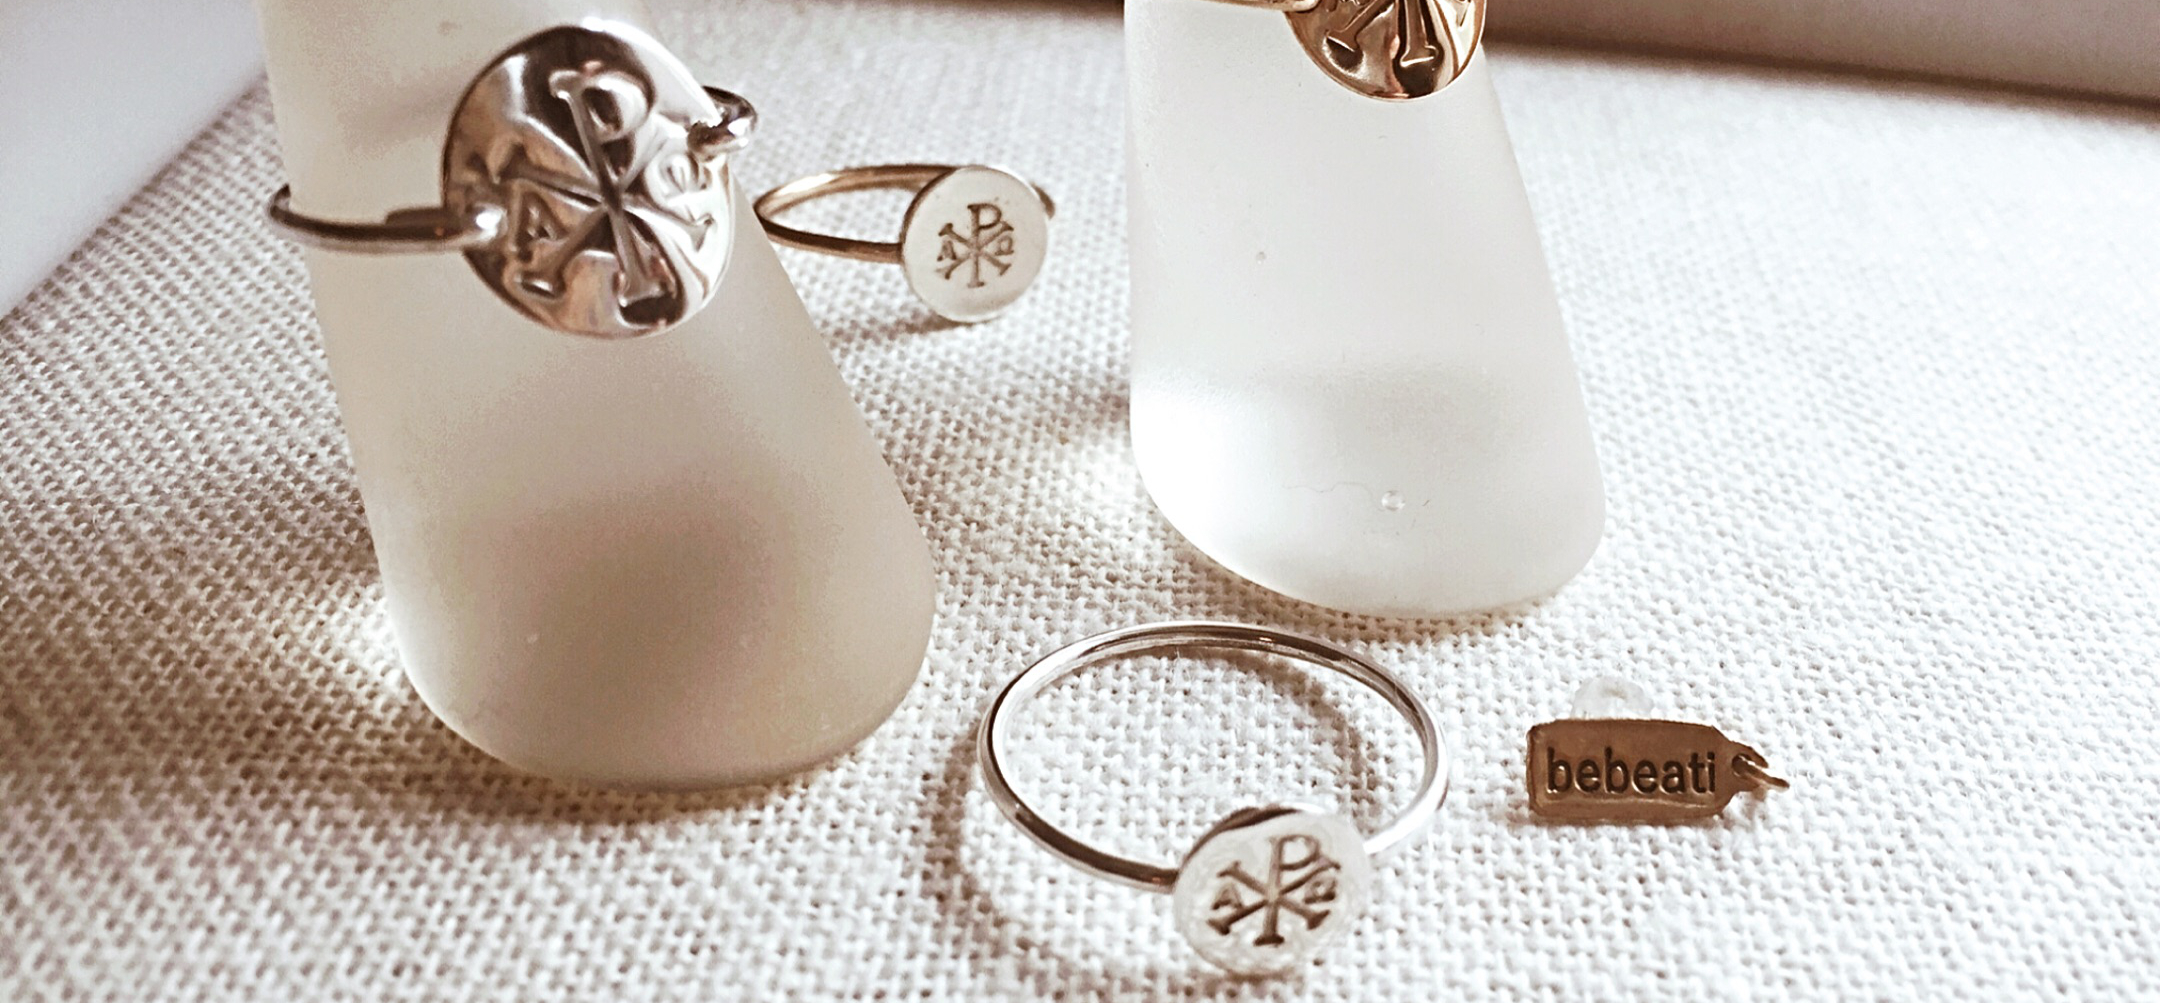 catholic-jewelry-chirho-rings-gift-idea-bebeati.jpg